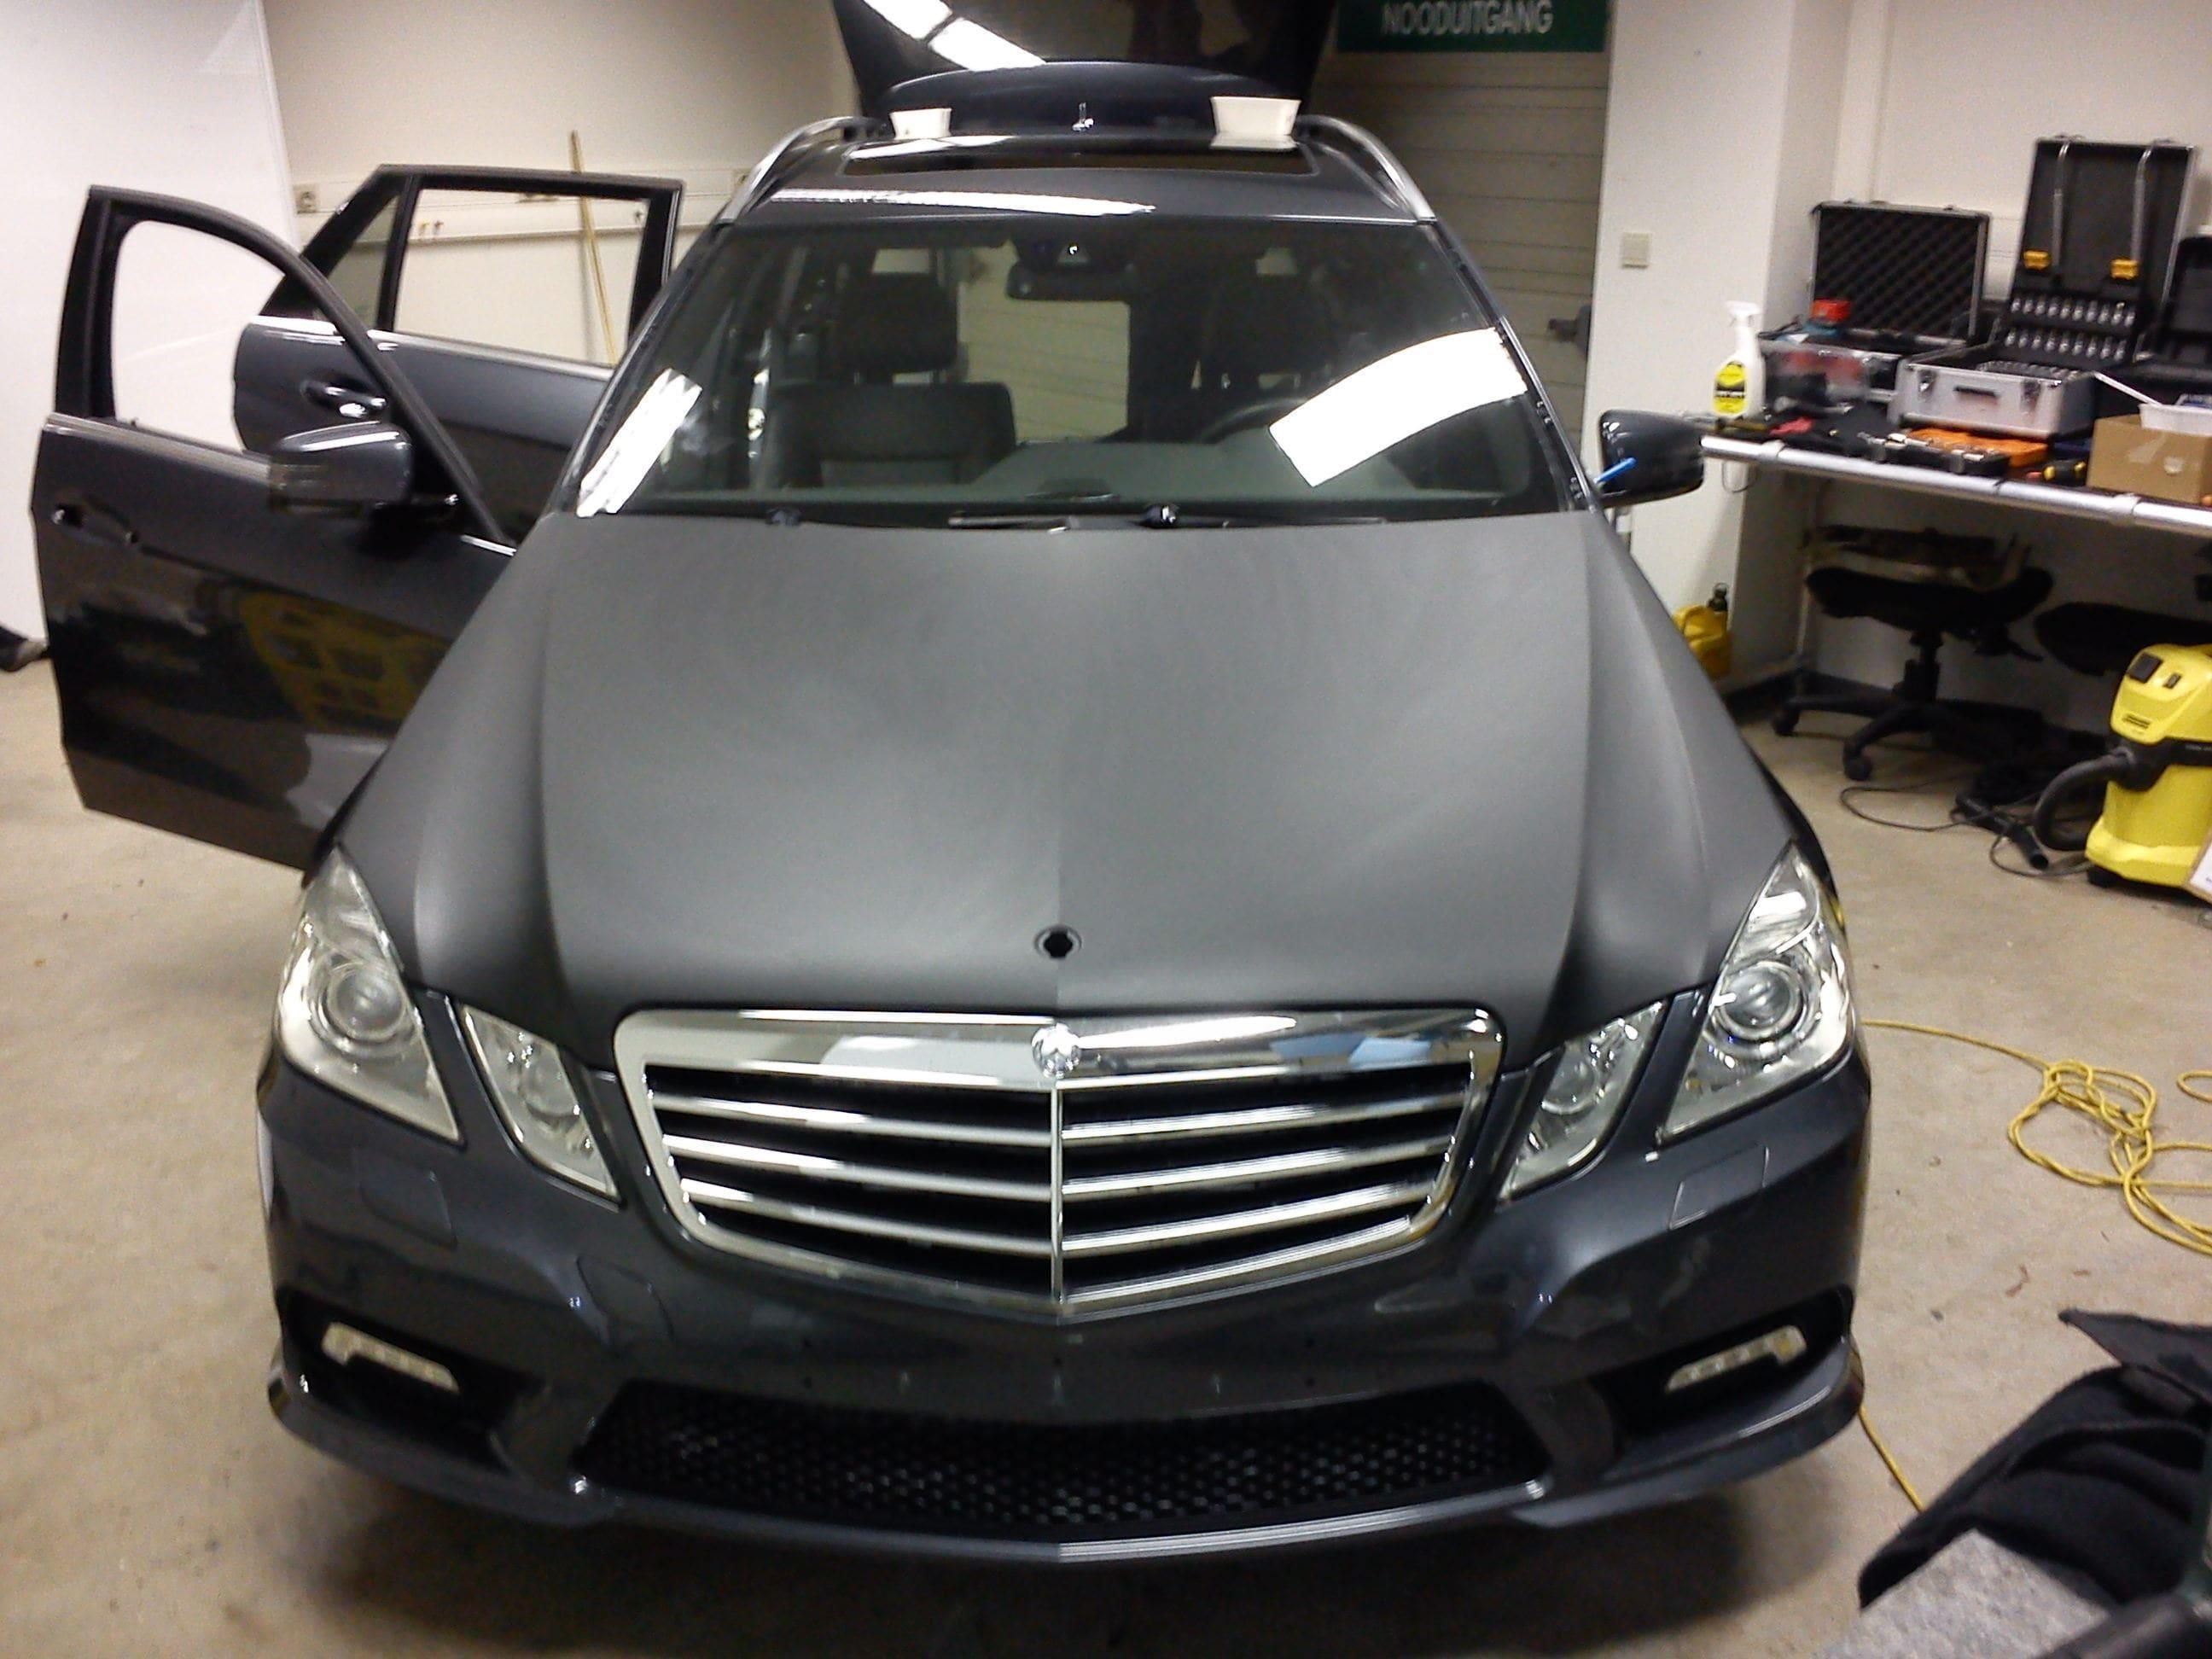 Mercedes E320 met Mat Zwarte Wrap, Carwrapping door Wrapmyride.nu Foto-nr:6224, ©2021